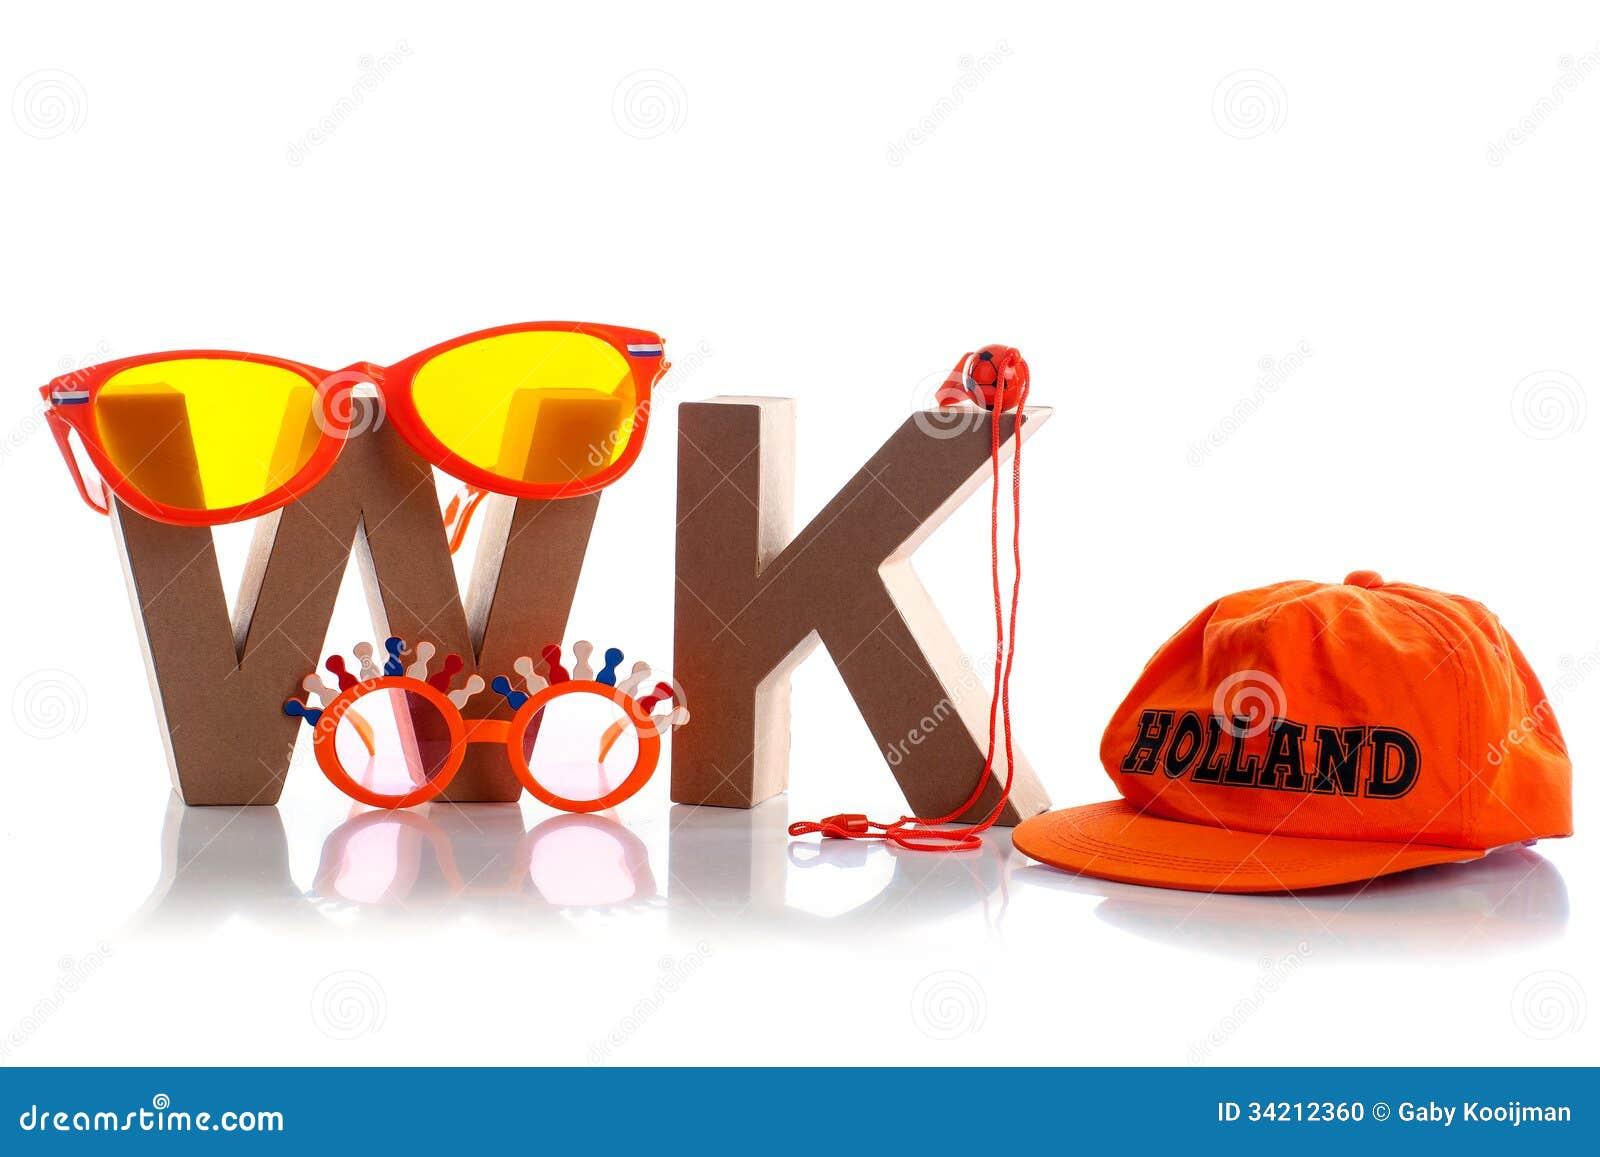 Nederlandse fanstuff